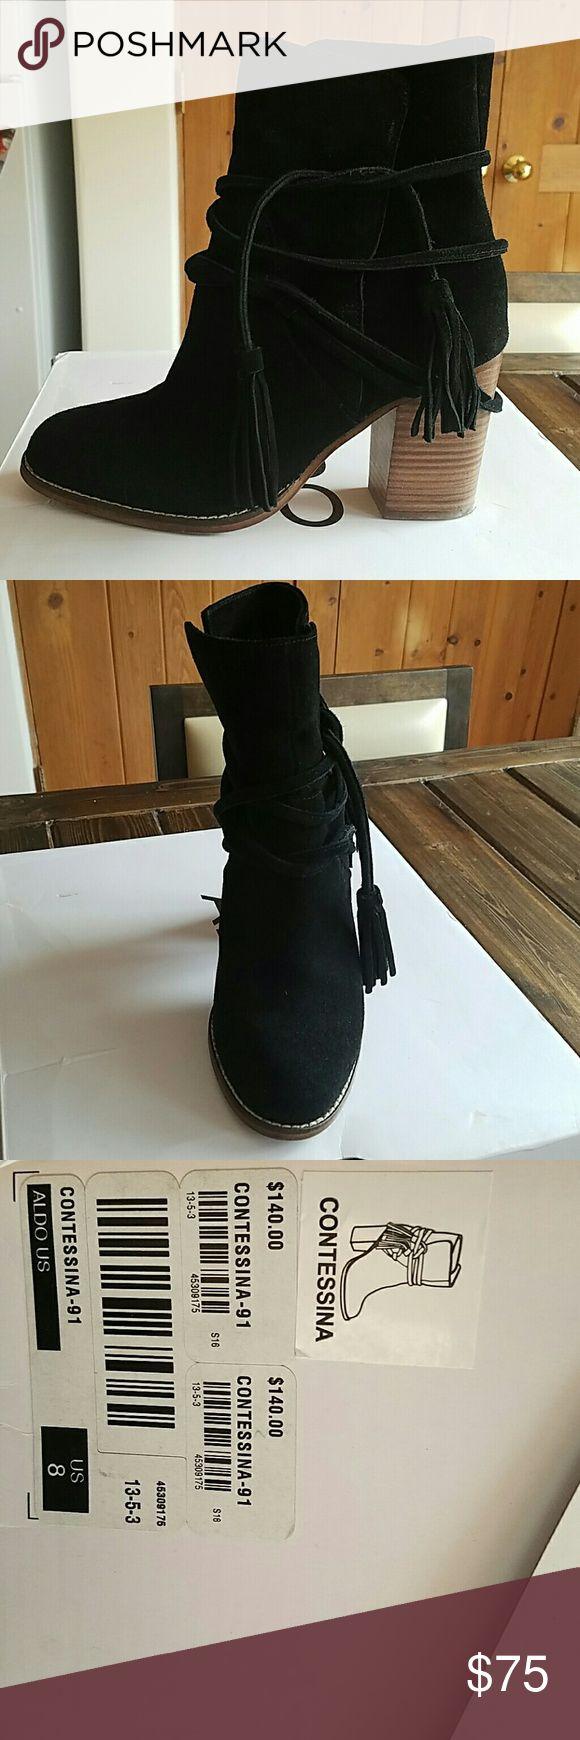 Black suede aldo boots Excellent condition, black suede aldo boots. Aldo Shoes Ankle Boots & Booties